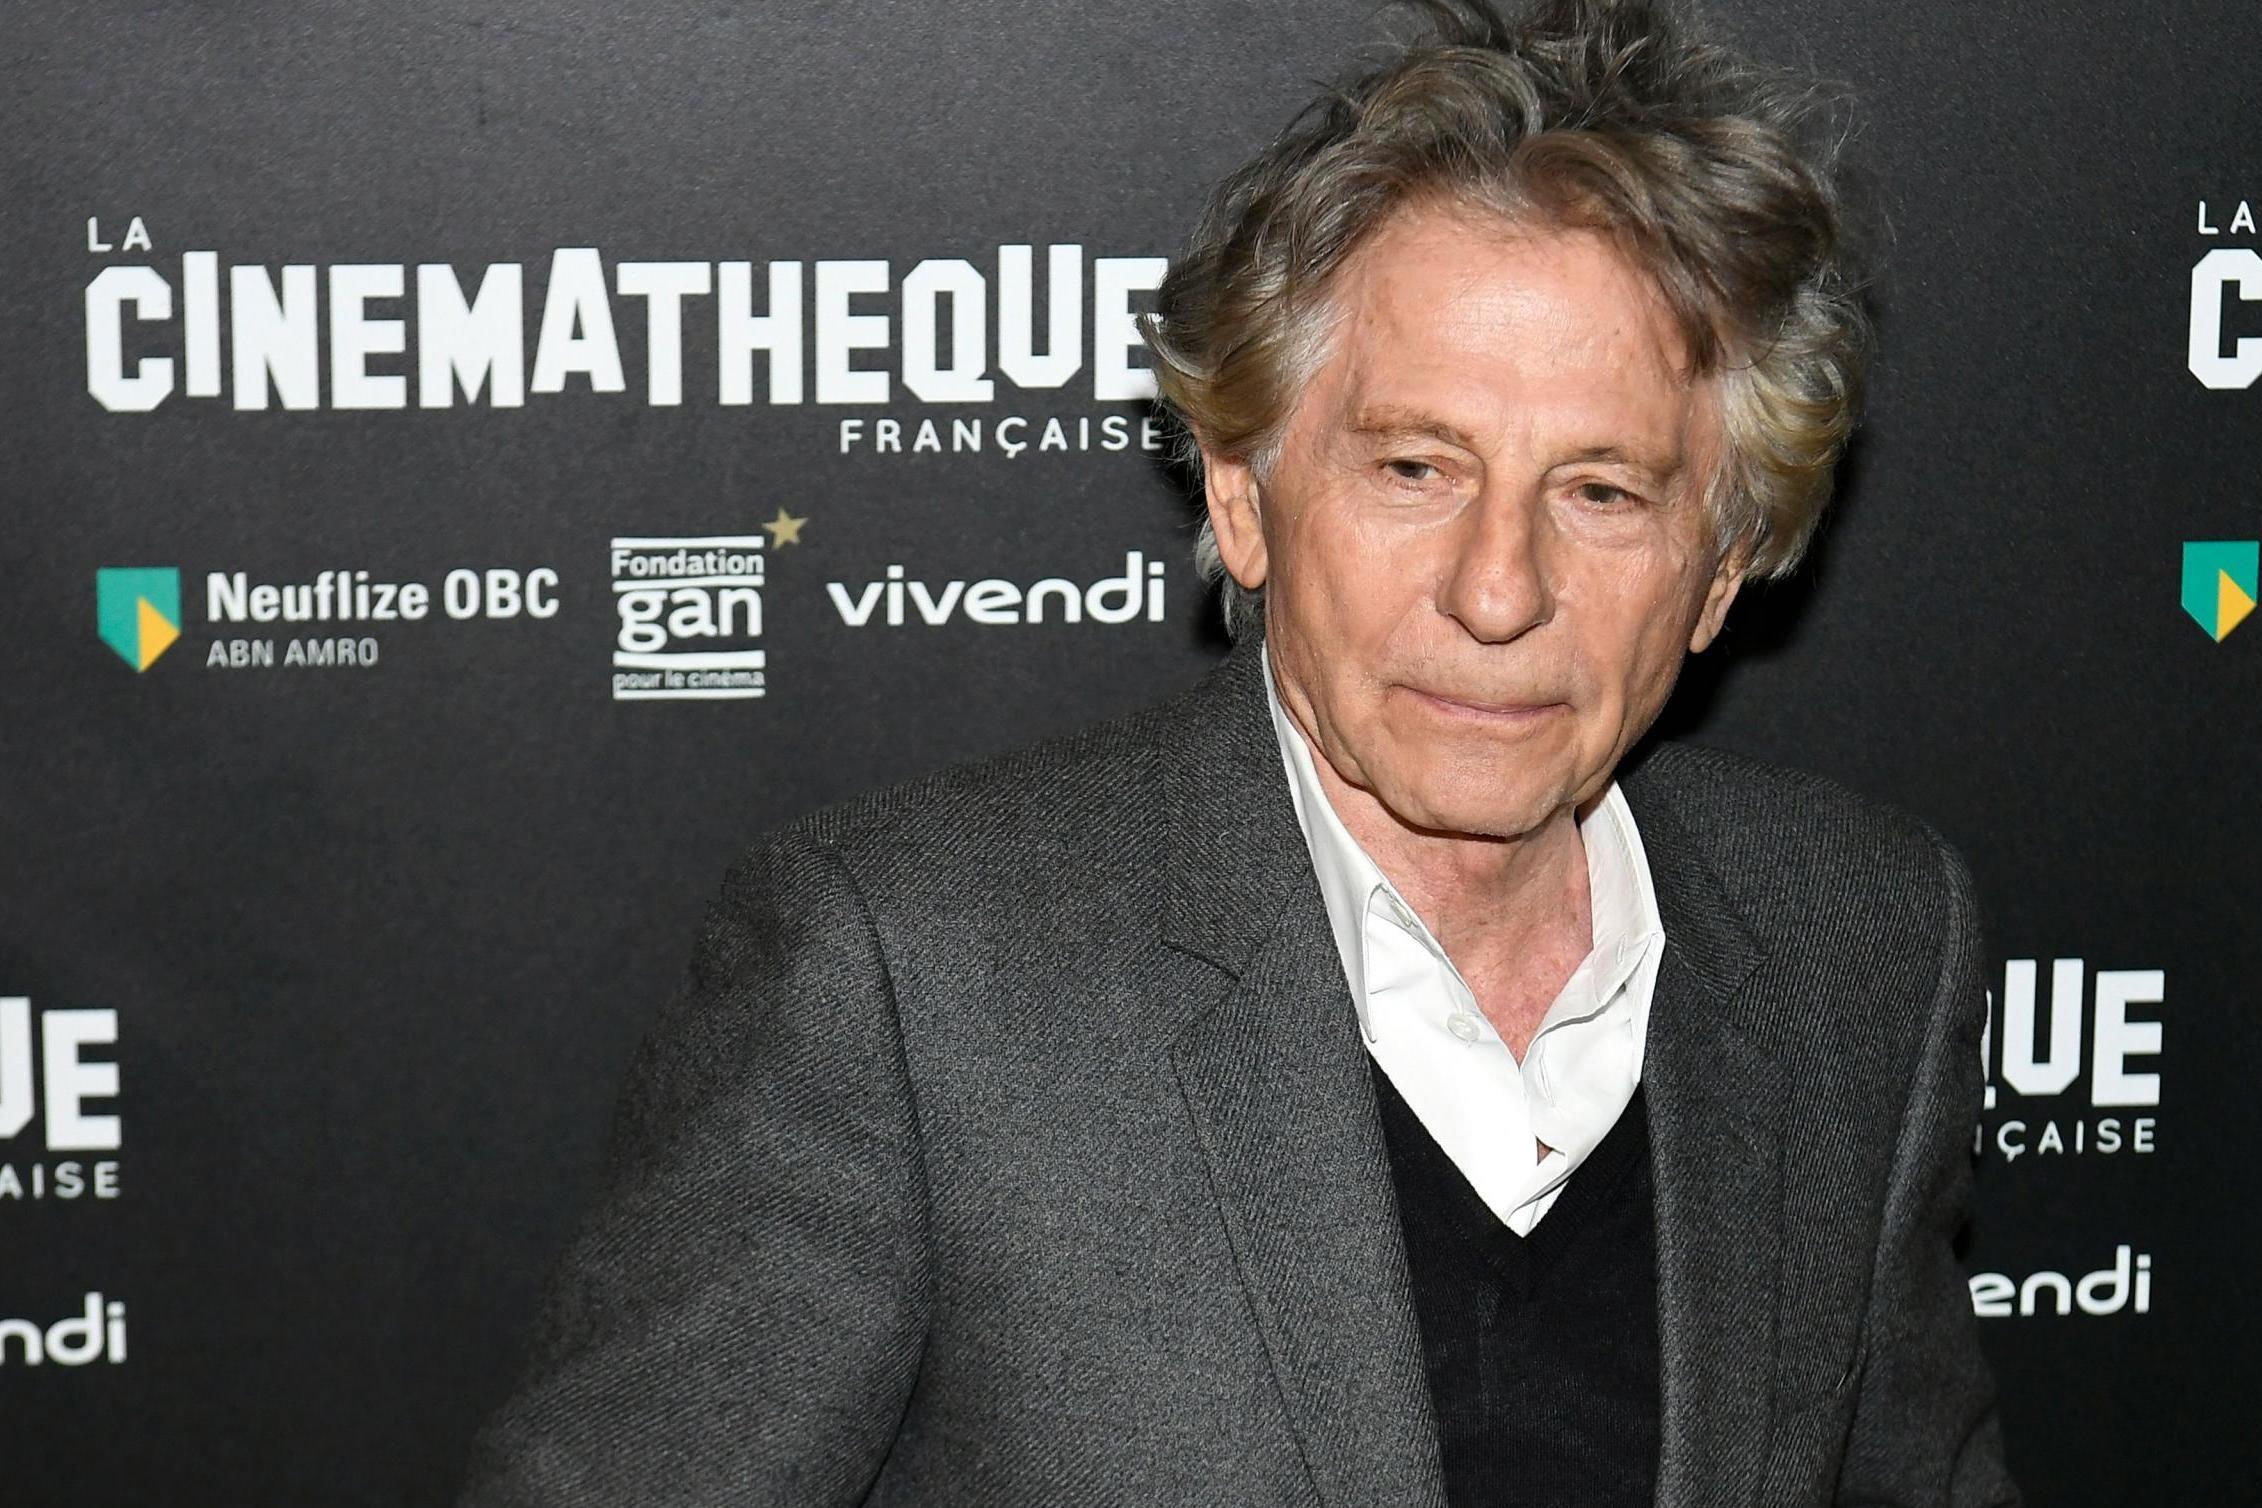 Roman Polanski sues Academy Awards organisation asking it to reinstate his membership